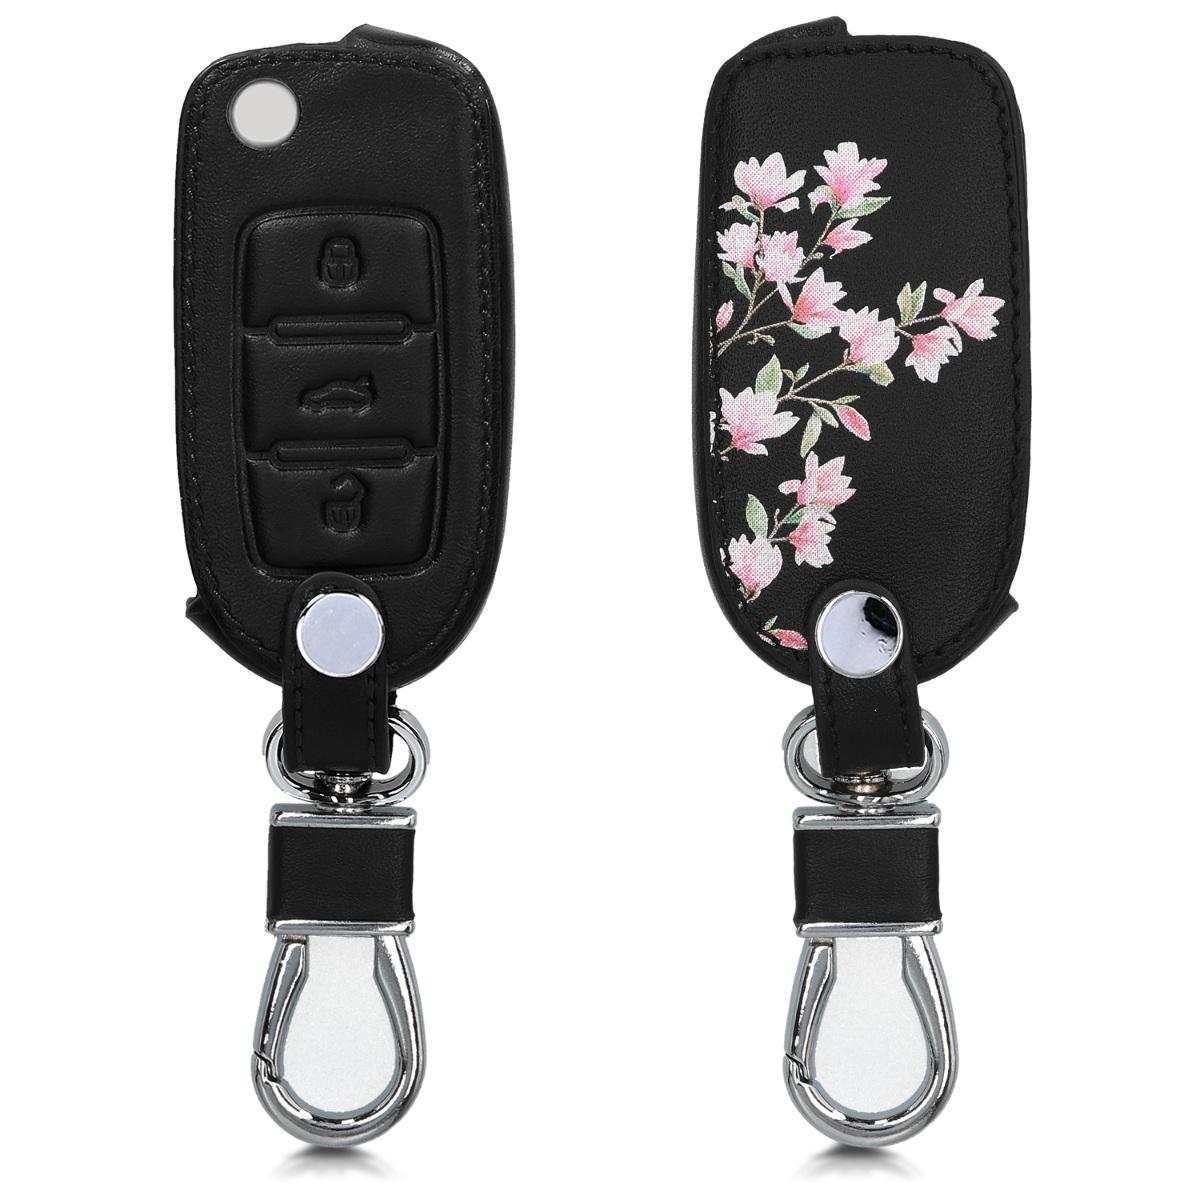 KW Θήκη Κλειδιού VW Skoda Seat -  3 Κουμπιά - Light Pink / White / Black (43950.14)